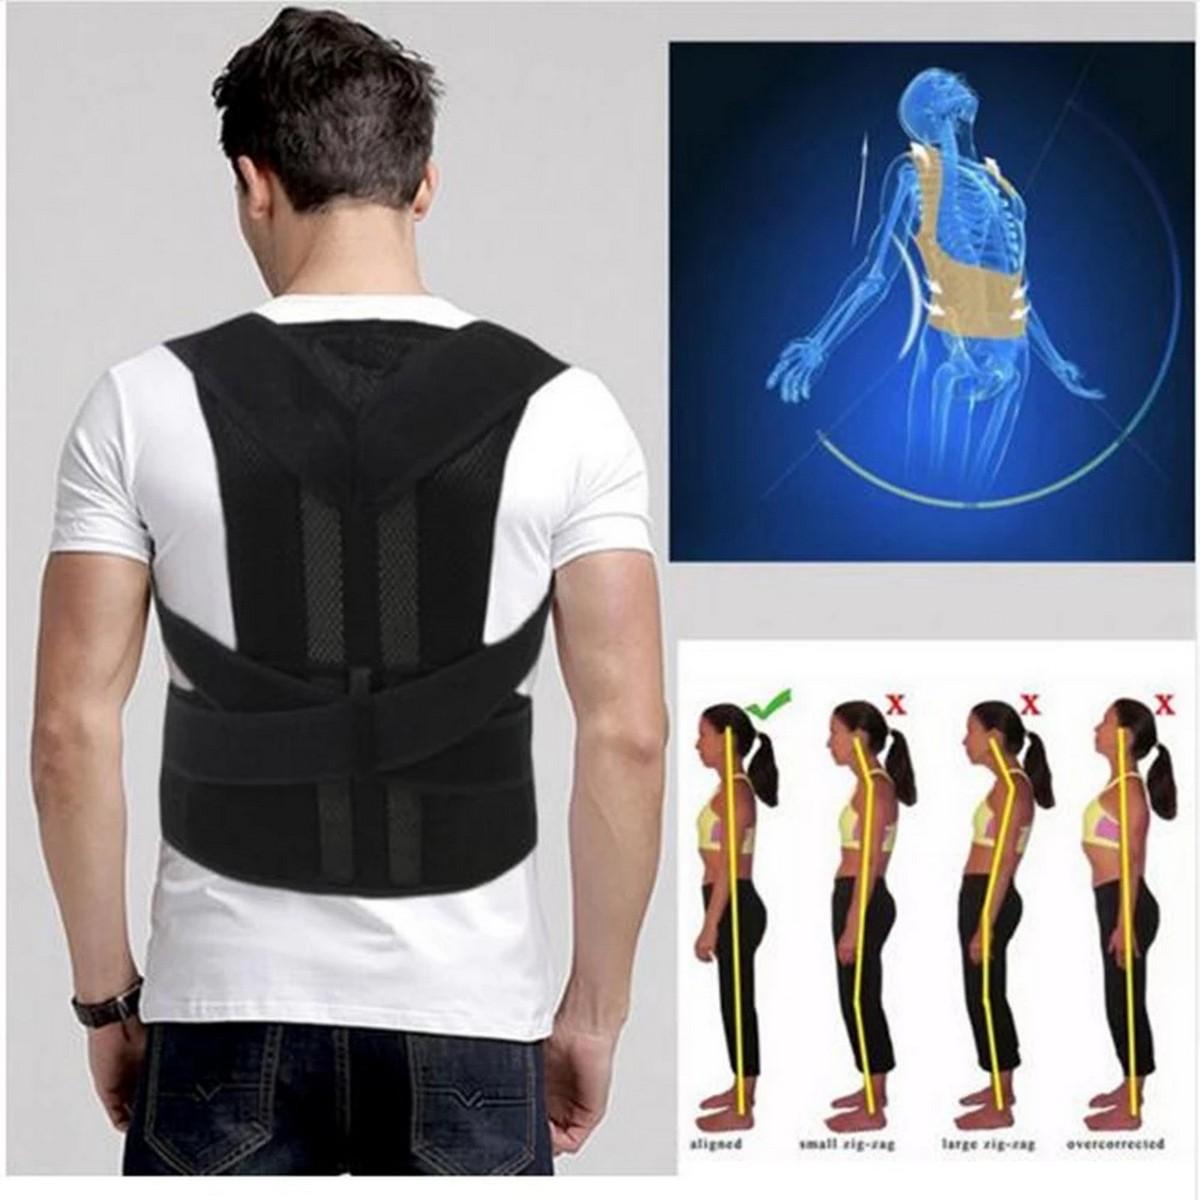 Adjustable Magnetic Therapy Posture Corrector Brace Shoulder Back Support Belt for Male Female Braces and Supports Belt